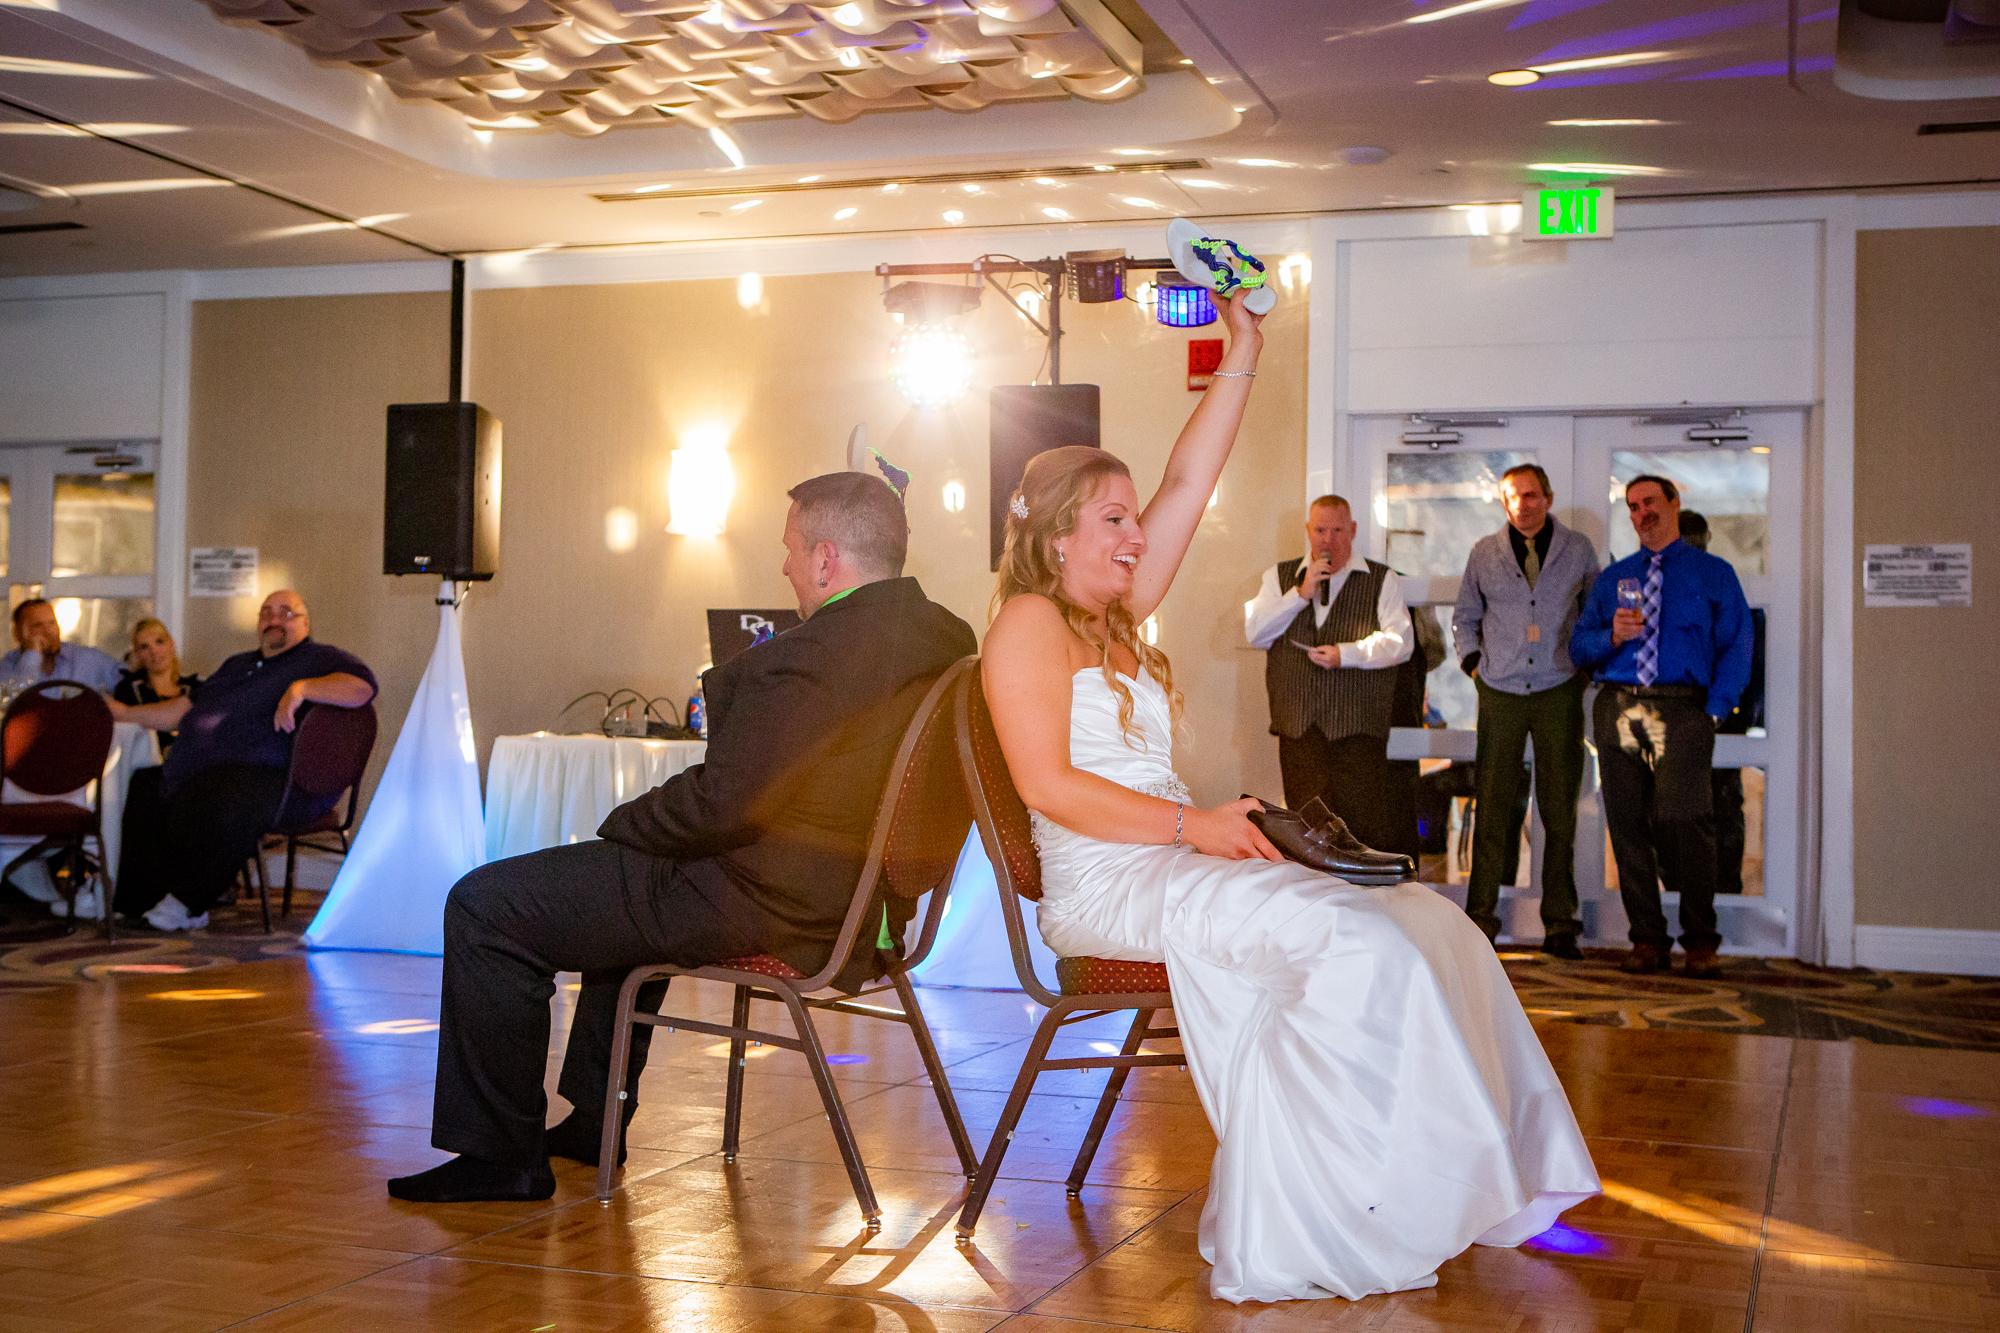 Raddison-Hotel-Corning-NY-Wedding-4546.jpg